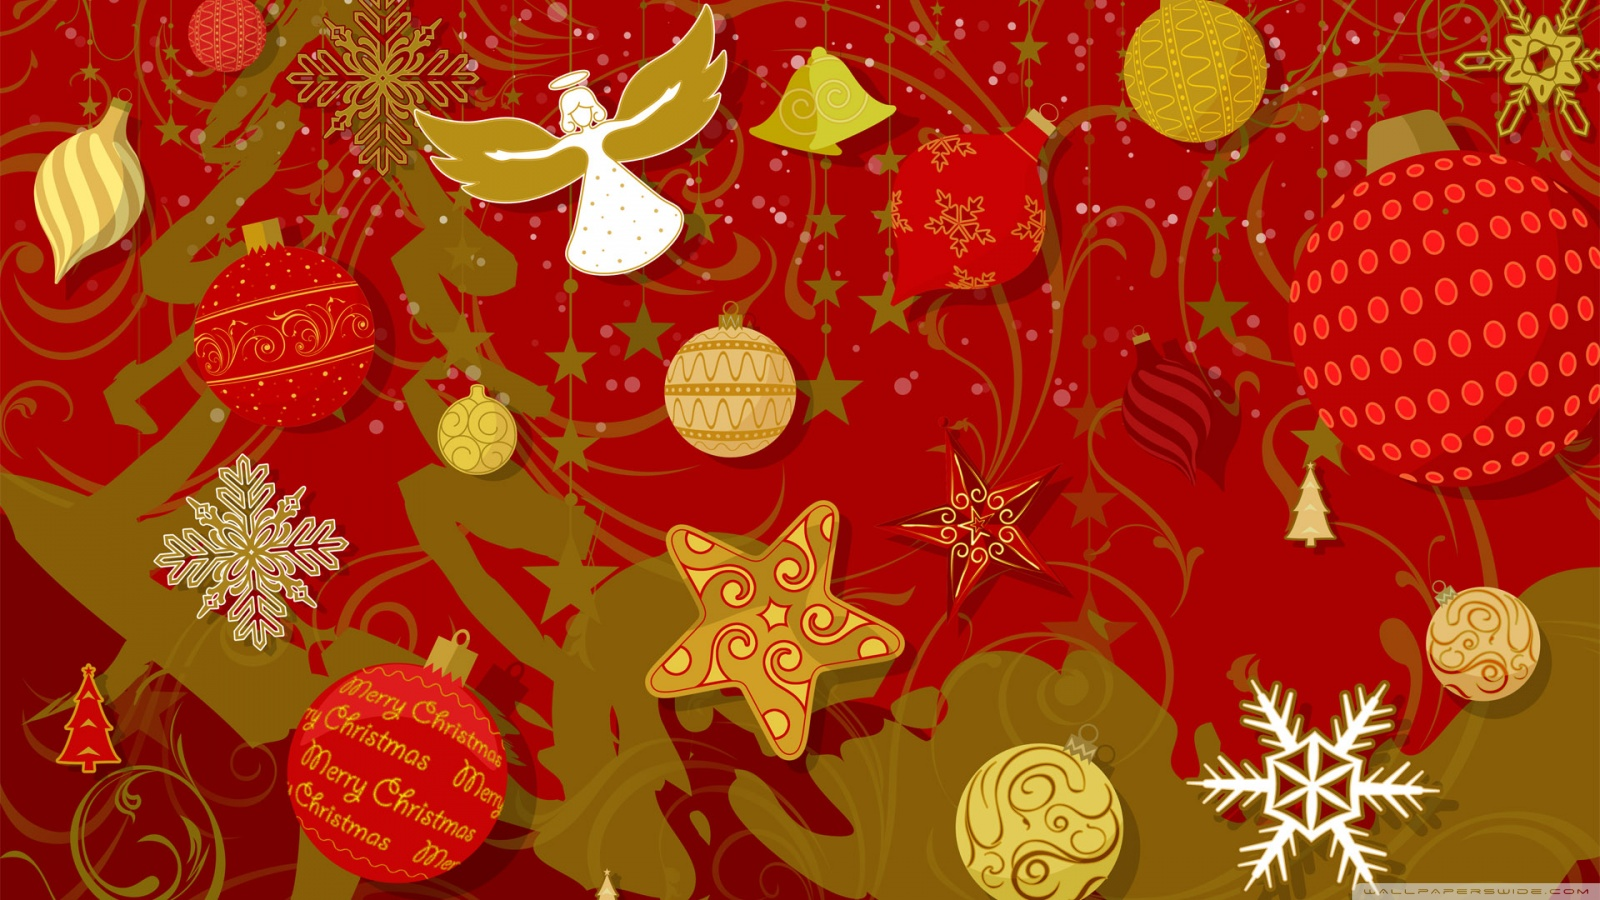 http://3.bp.blogspot.com/-4WLMbo_bKLQ/TsZYX86CqkI/AAAAAAAAC2E/SnJiDf__ktk/s1600/christmas_spirit_4-wallpaper-1600x900.jpg